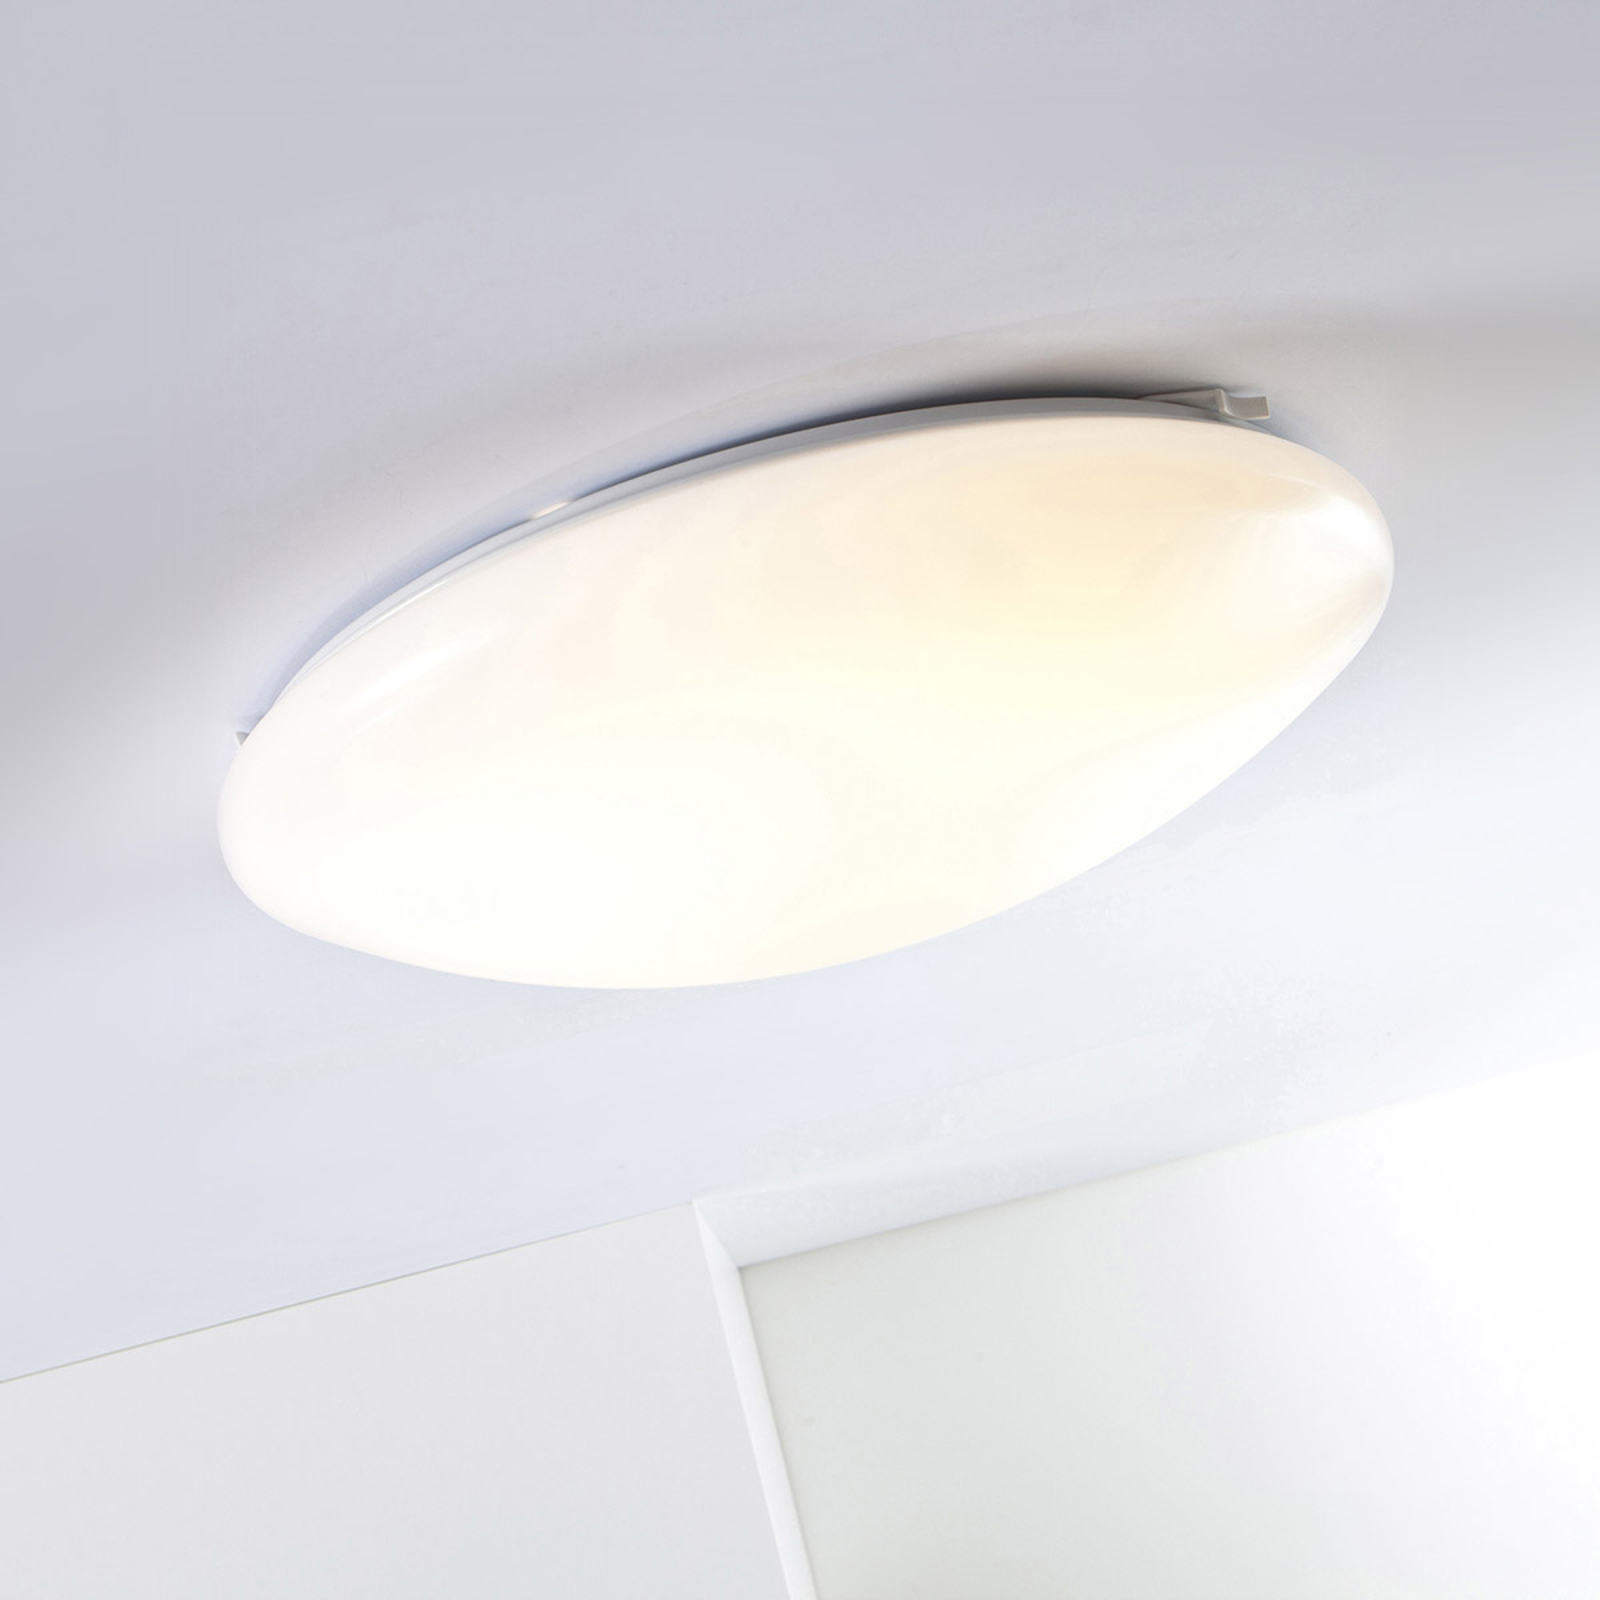 Plafón AEG LED Basic circular, 22 W